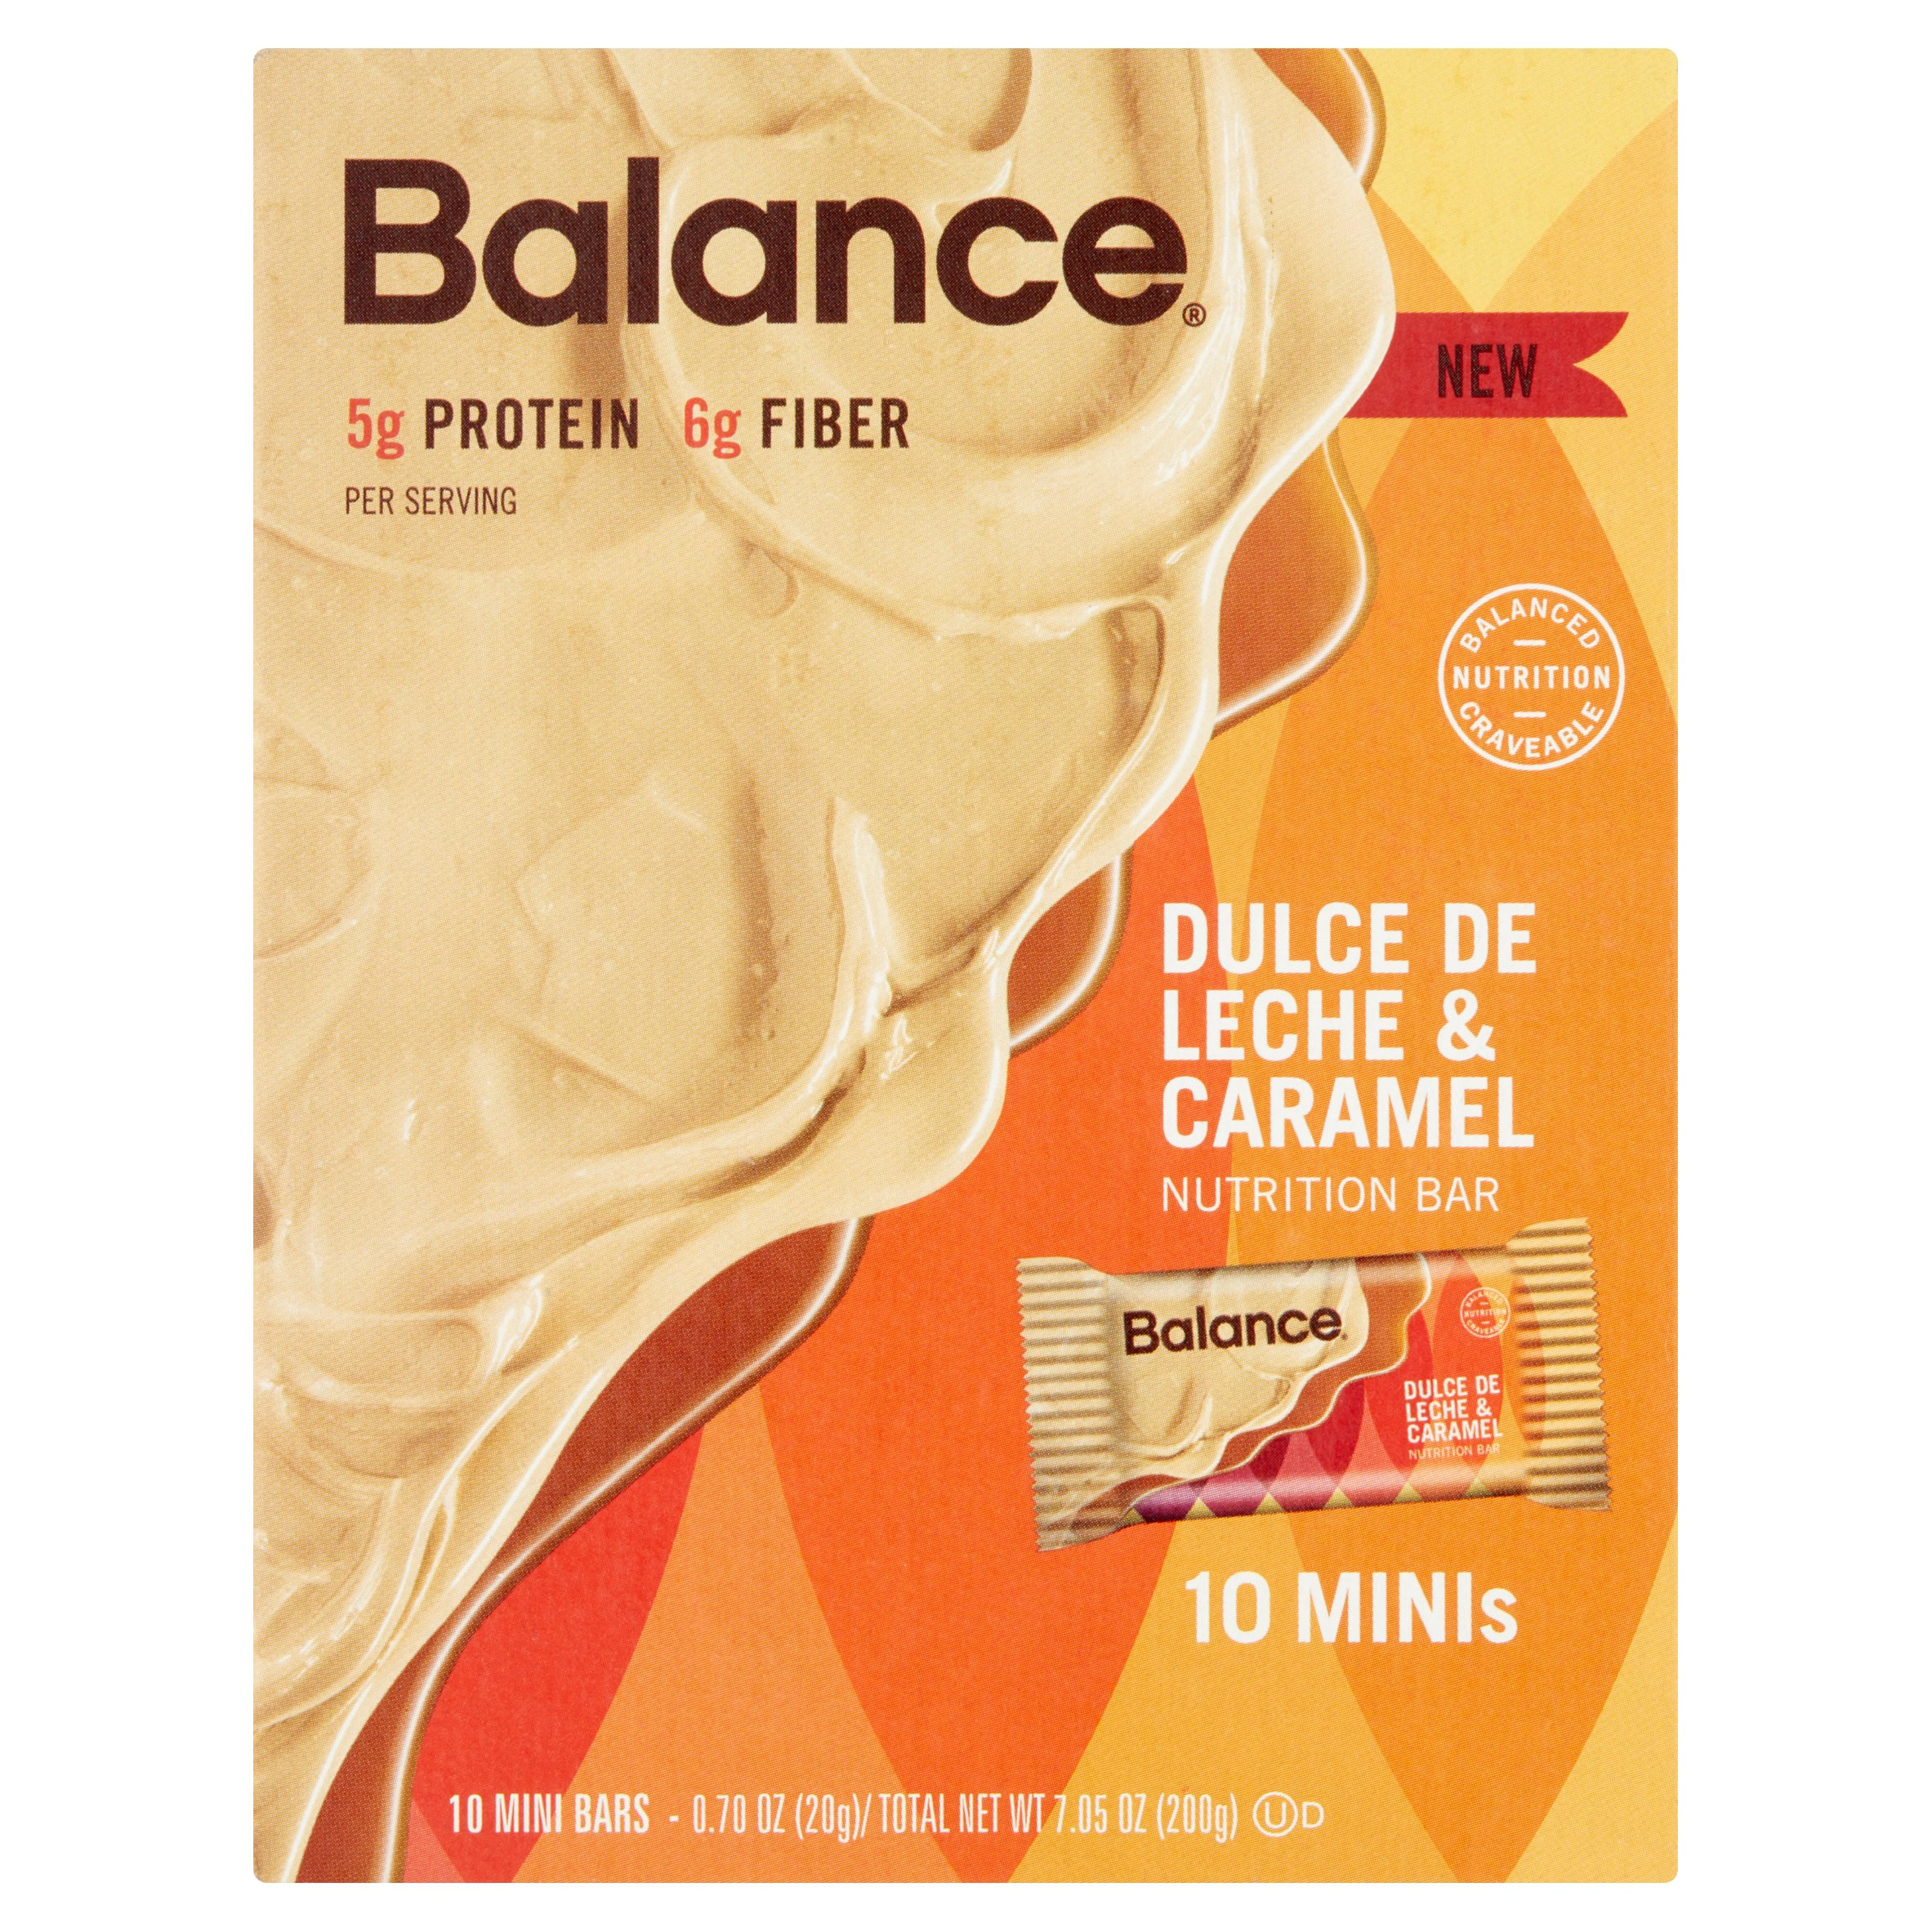 Orange Leaf Gift Card Balance Check Balance Dulce De Leche Caramel Nutrition Bar 0 70 Oz 10 Count